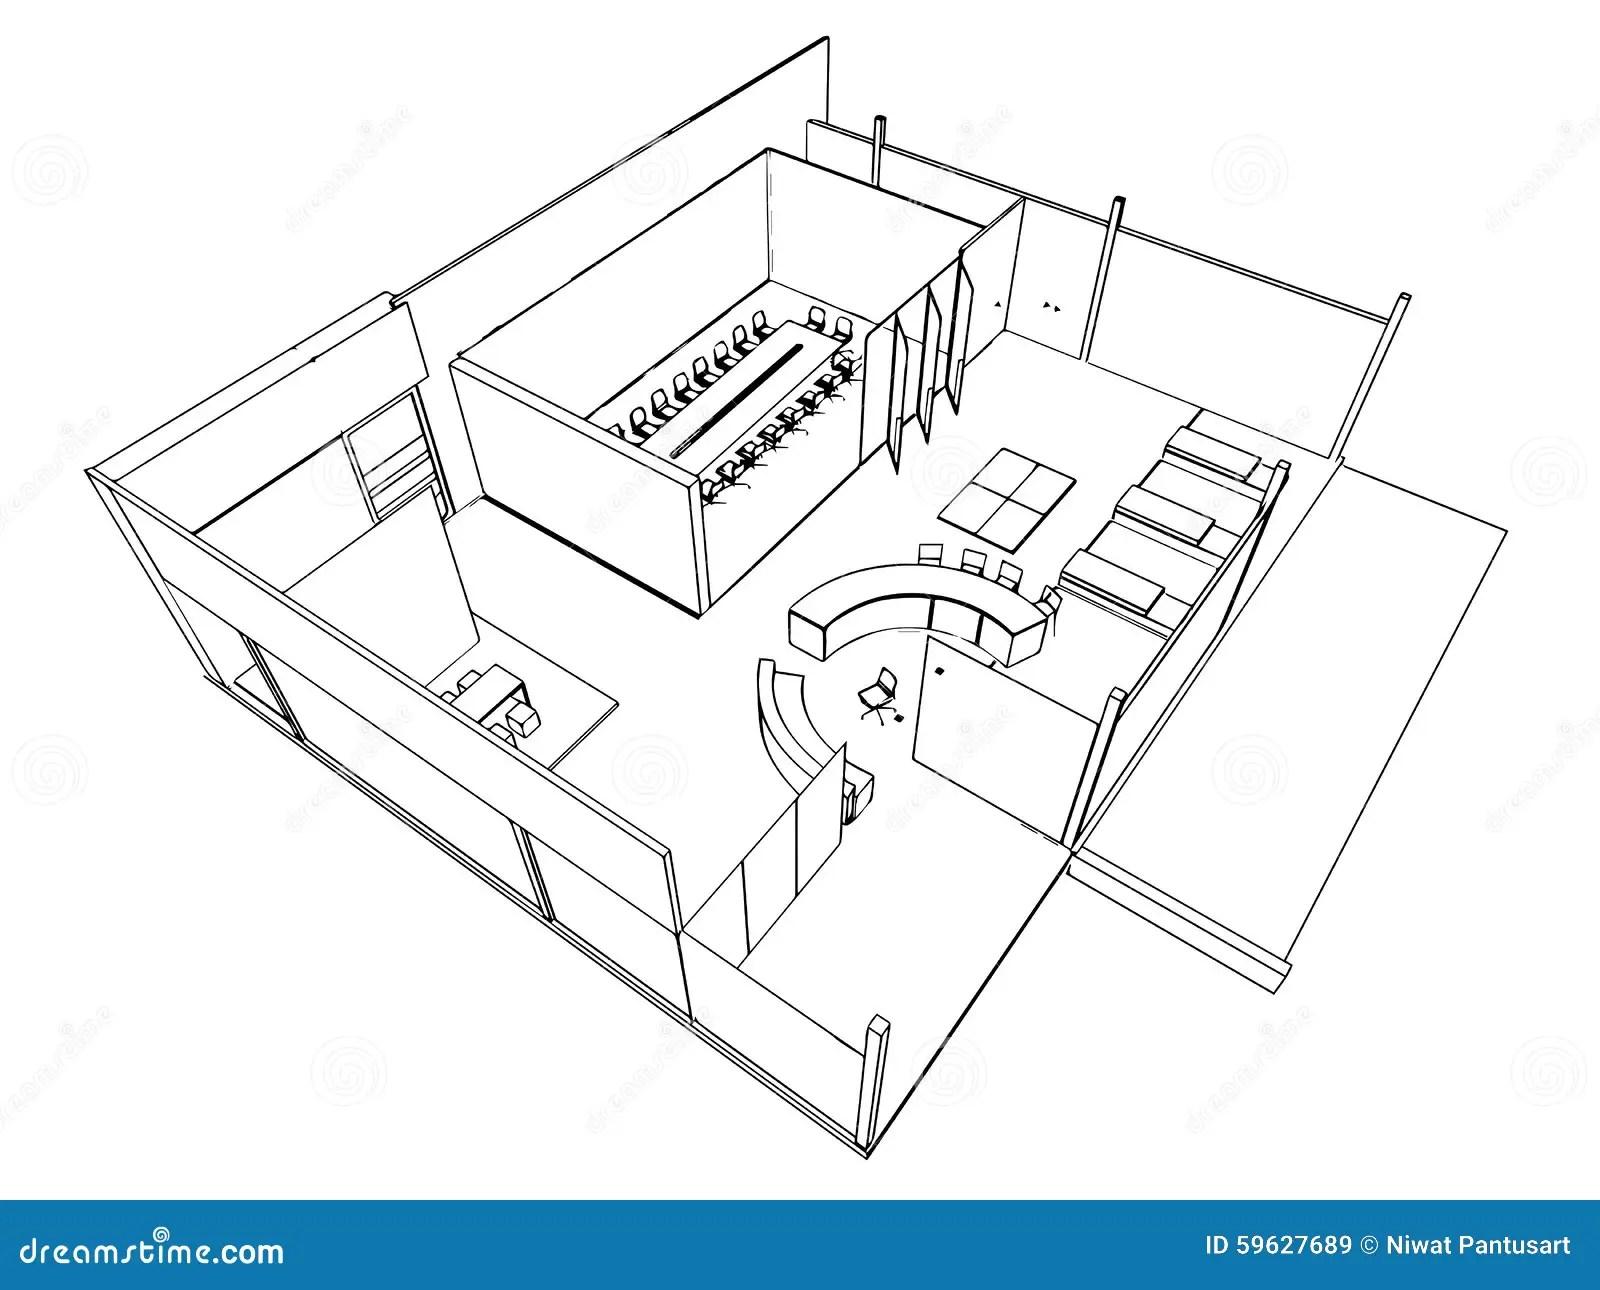 Outline Sketch Of A Interior Stock Vector